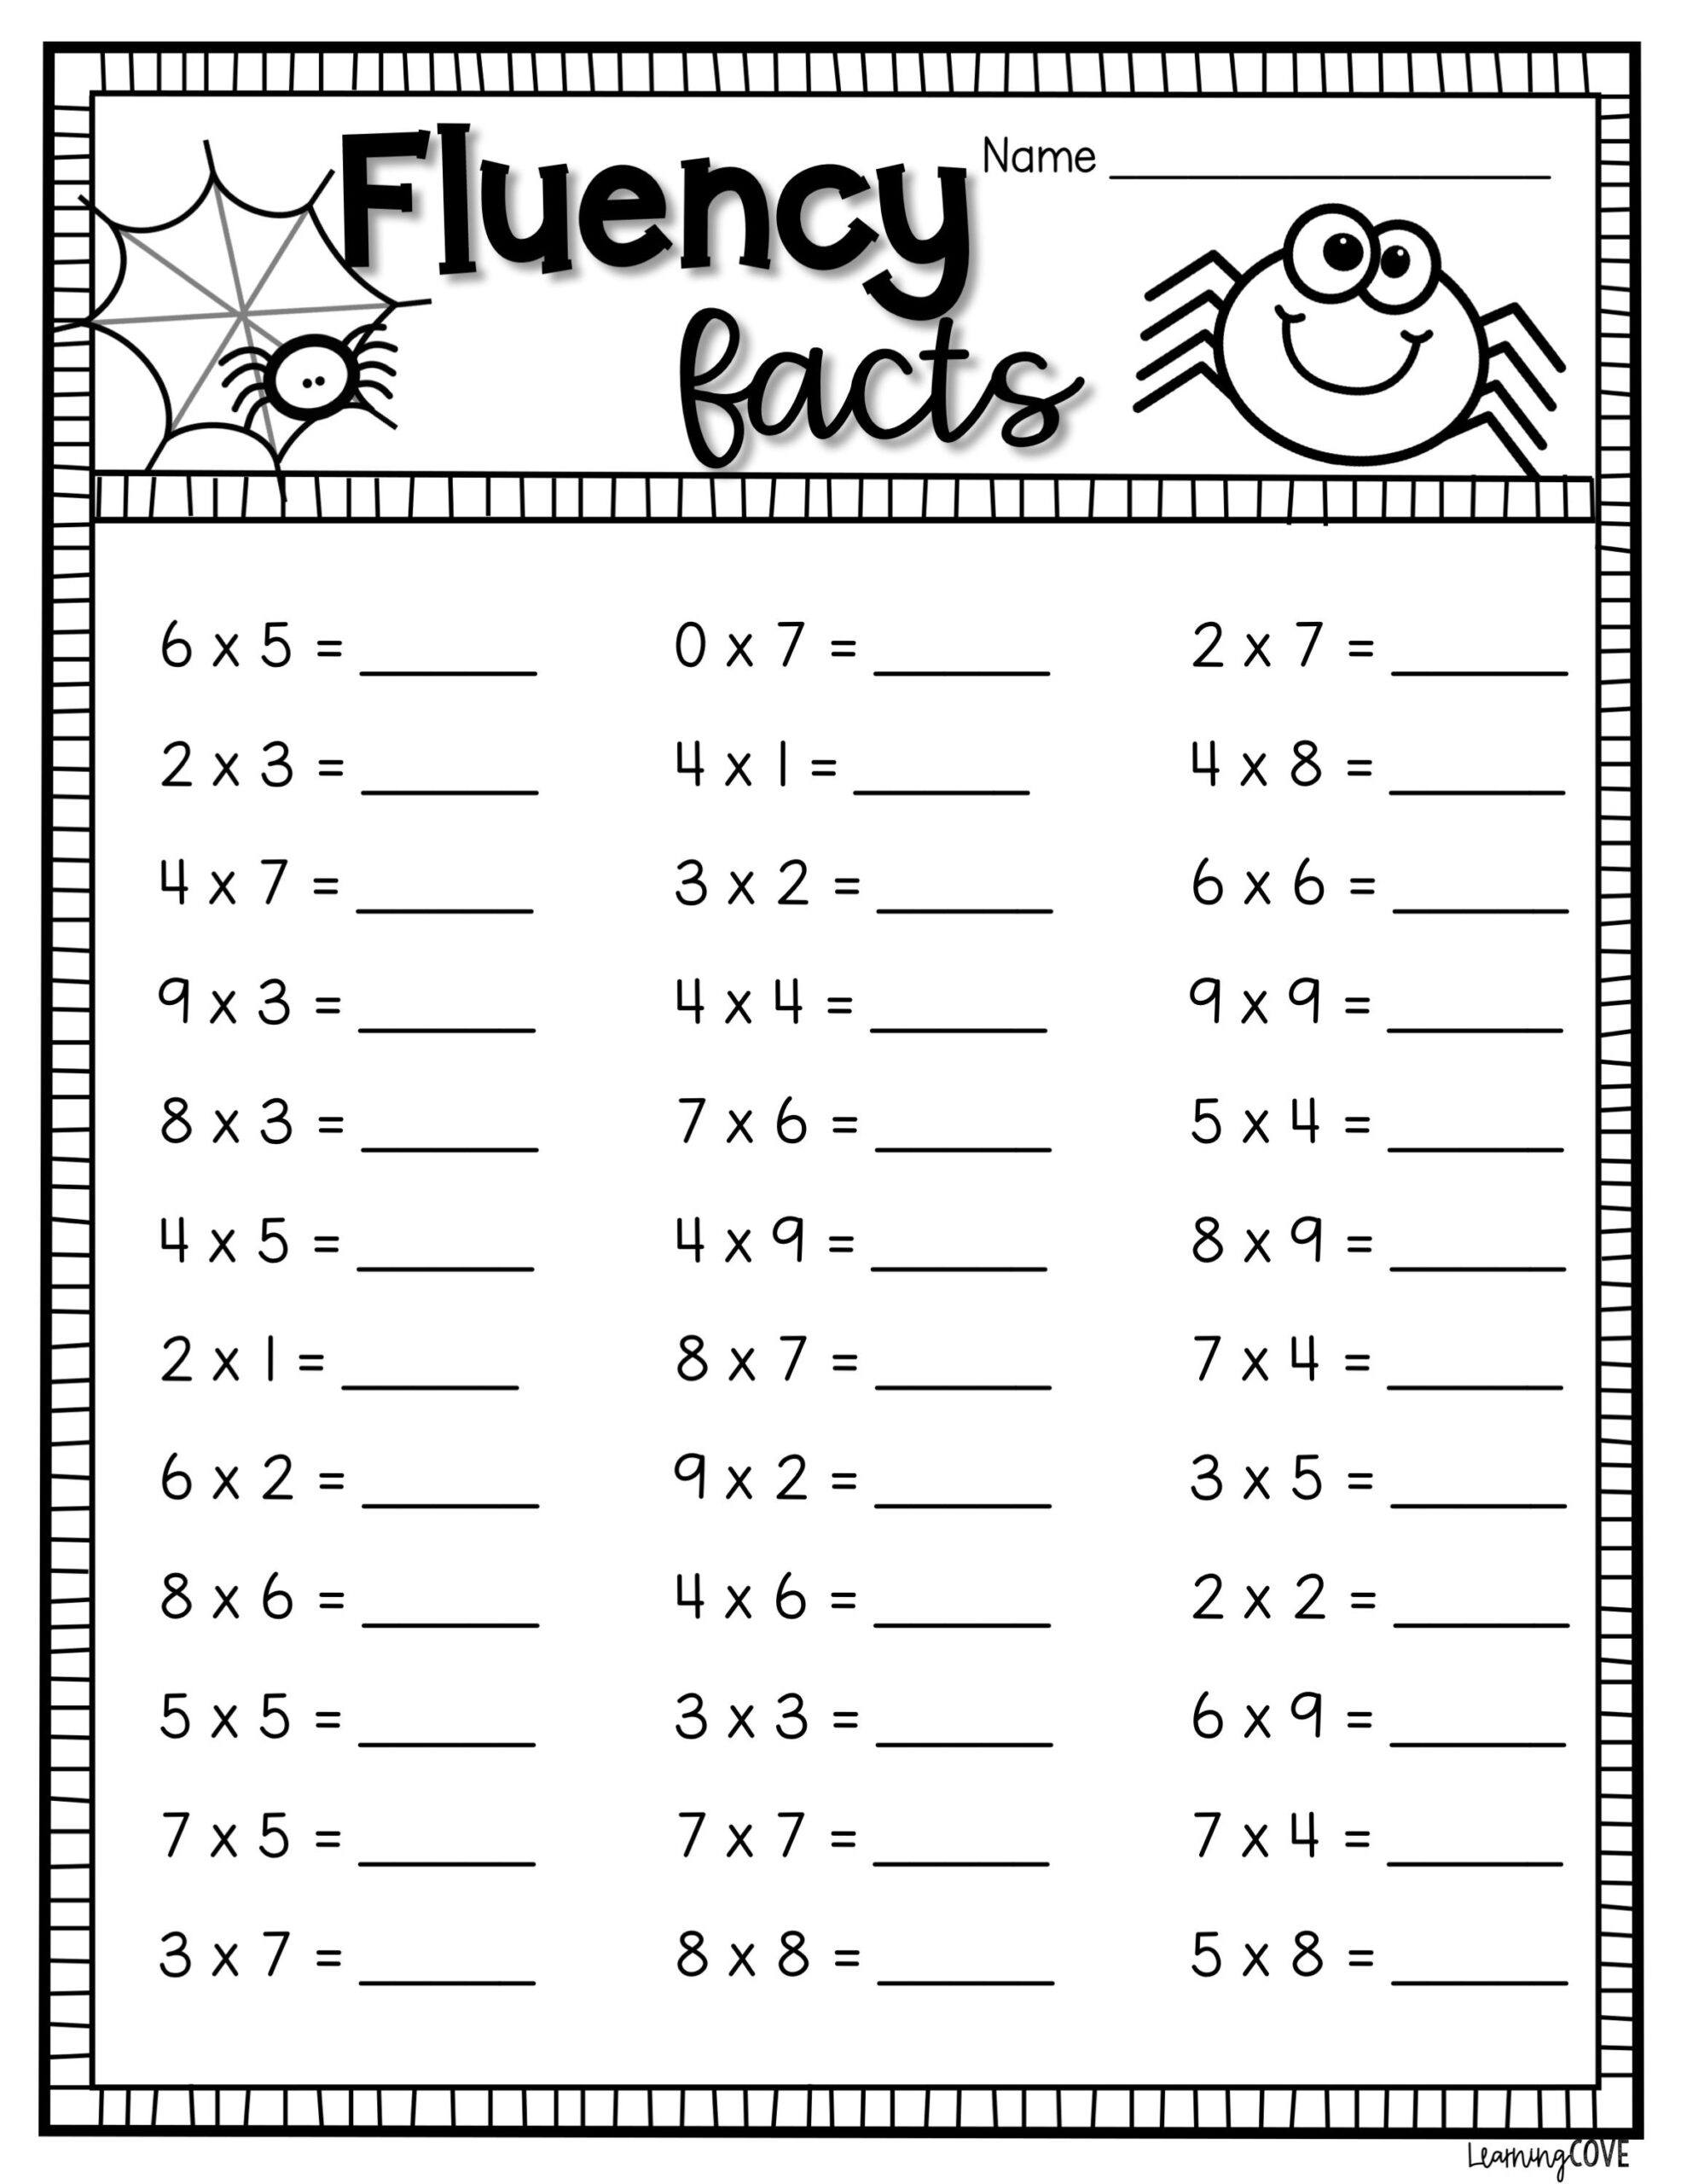 Halloween Math Worksheets For Grade 6